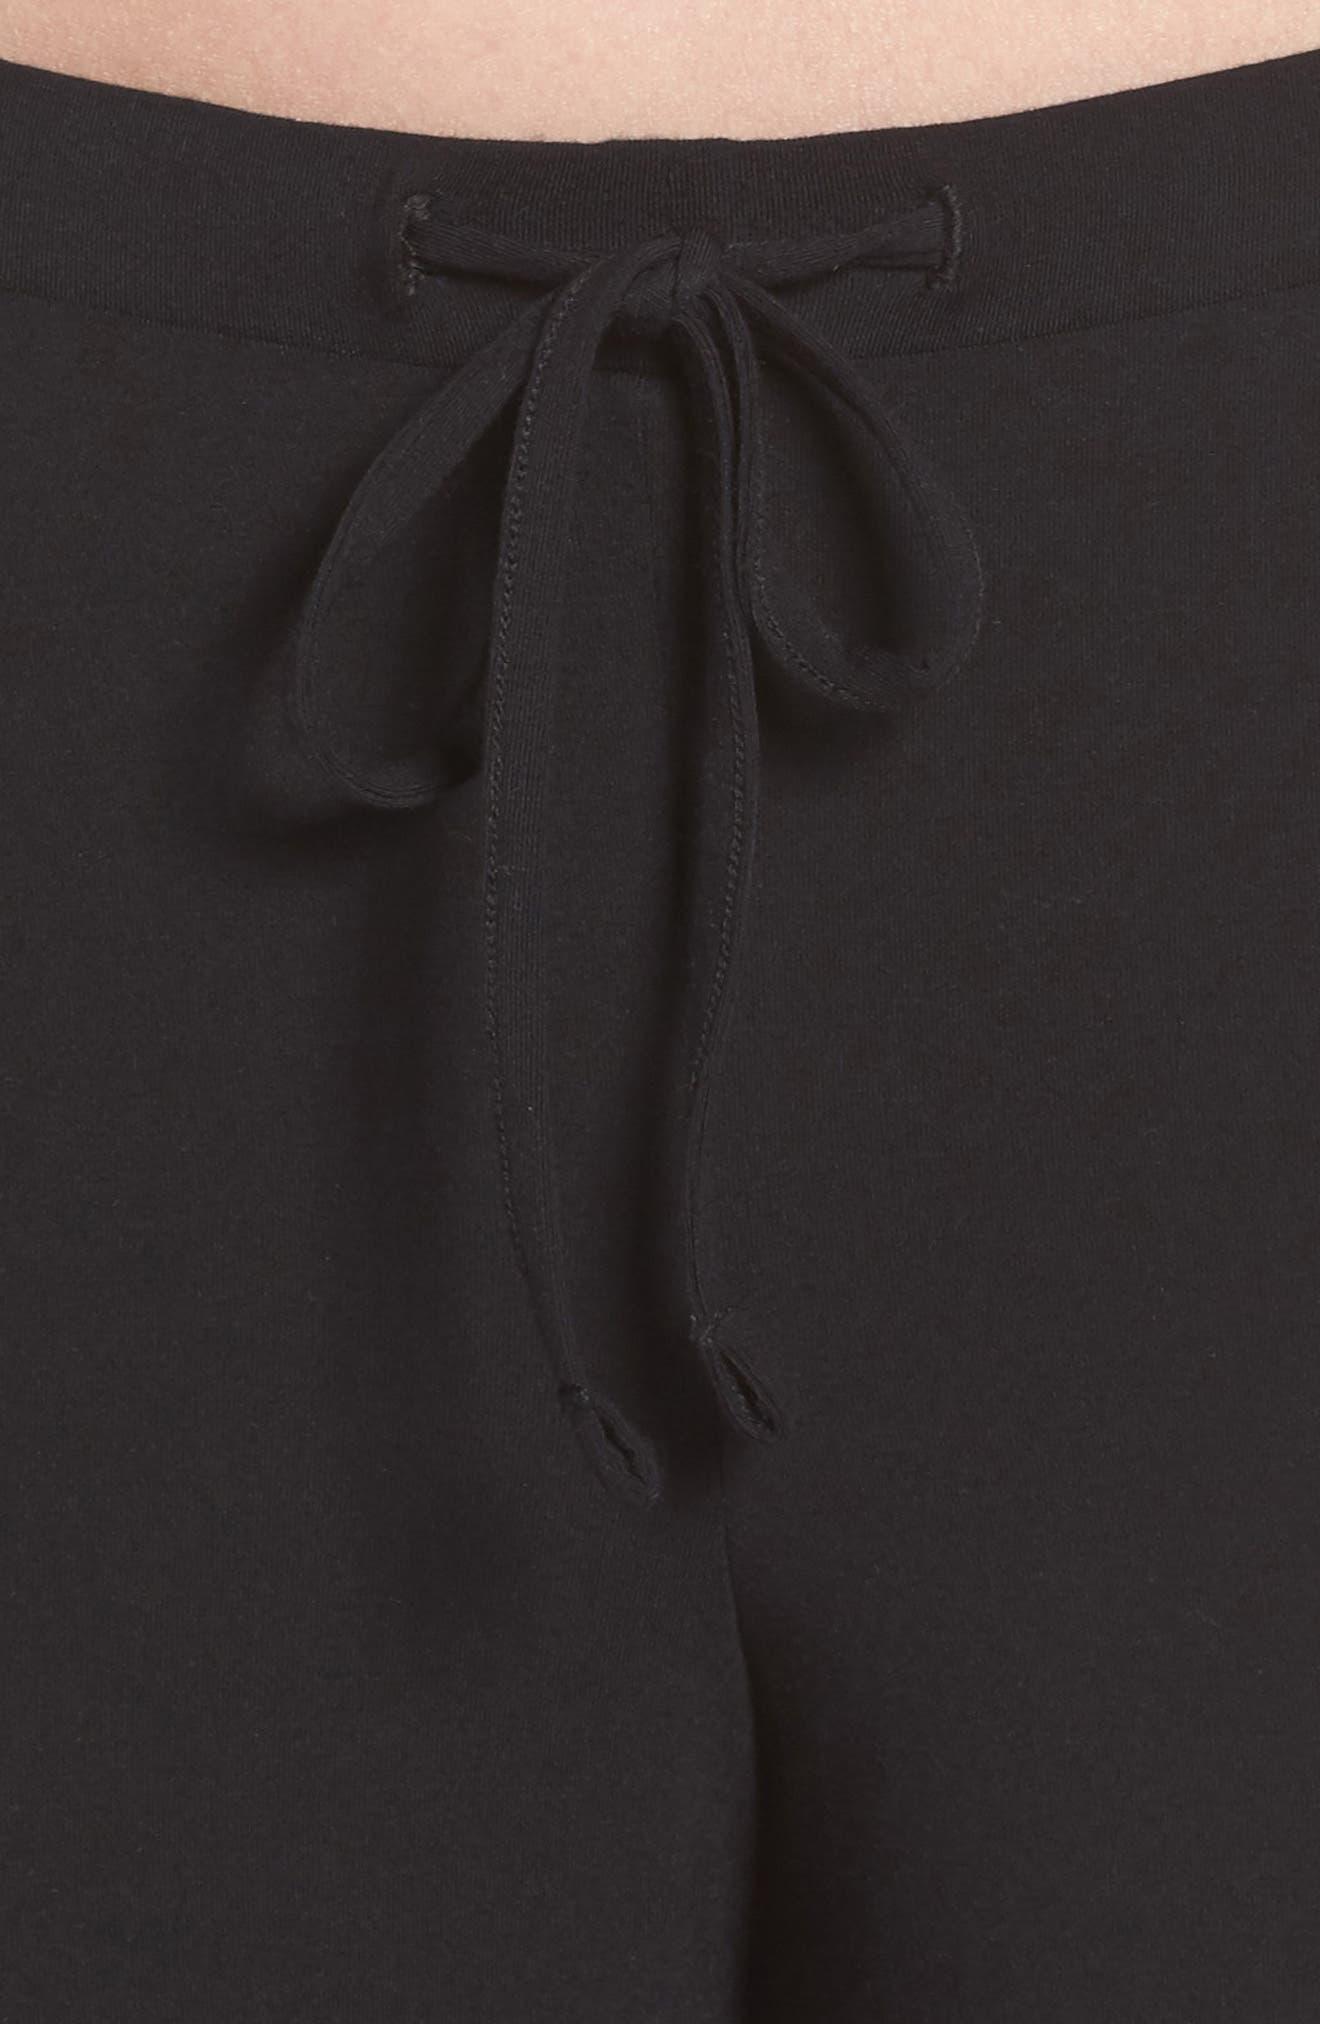 Breathe Stretch Modal Pants,                             Alternate thumbnail 4, color,                             BLACK